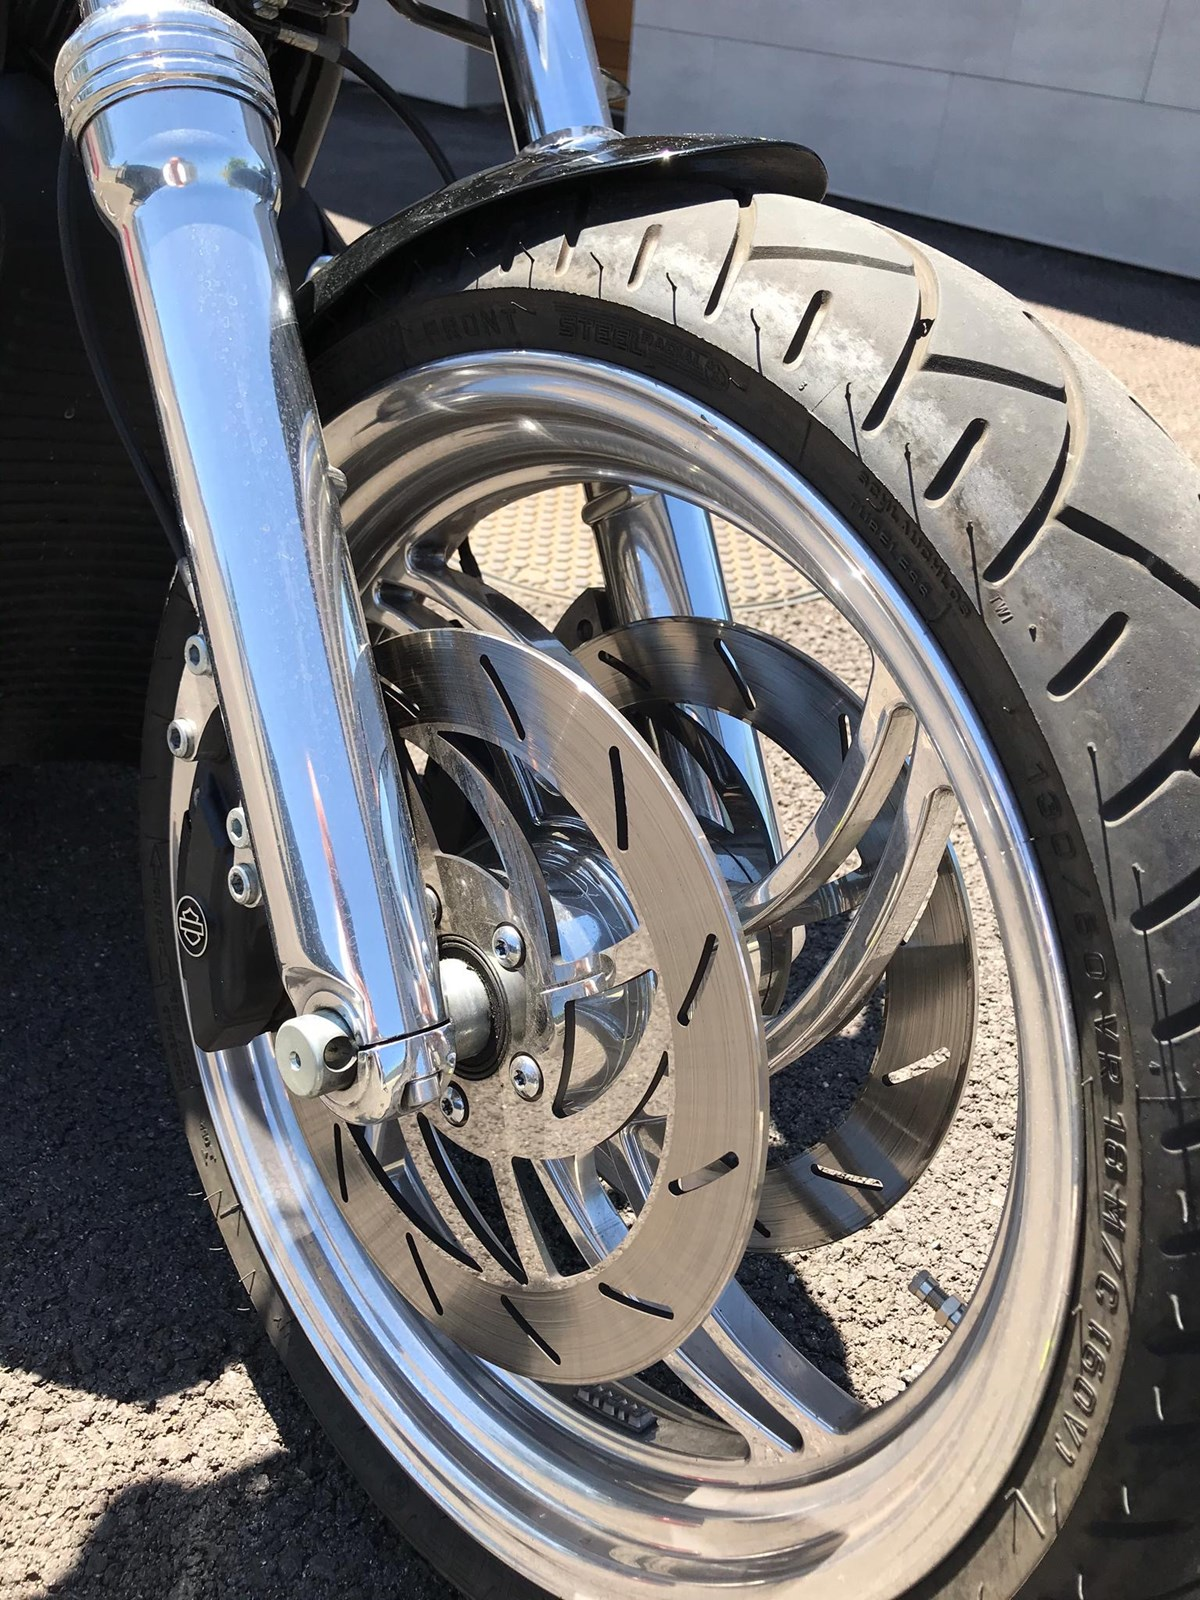 Harley-Davidson VRSCD 1130 V-Rod Night Road